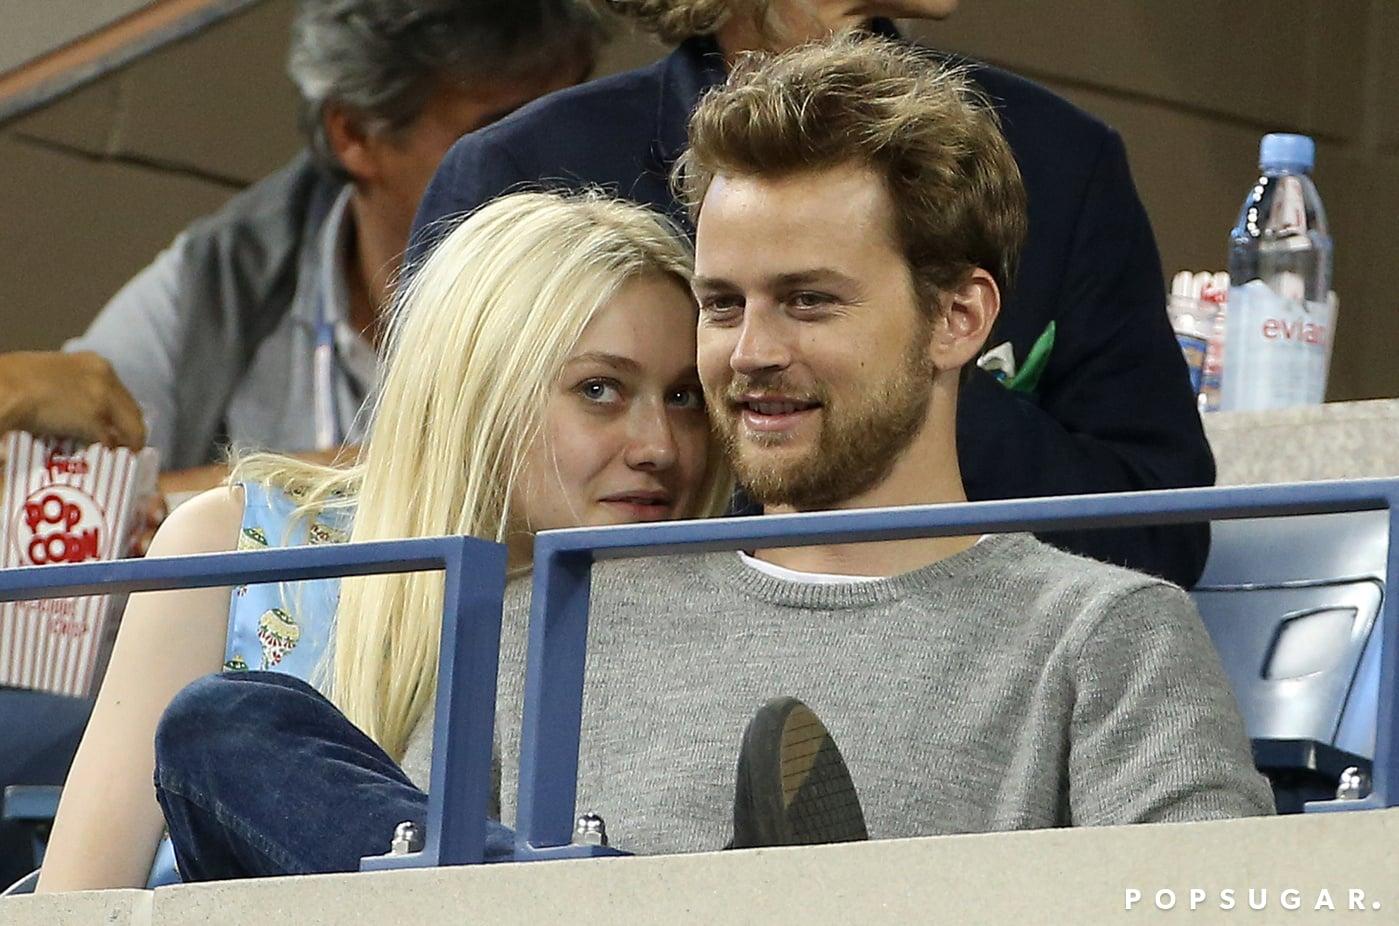 Dakota Fanning cozied up to her boyfriend, Jamie Strachan, during the match.